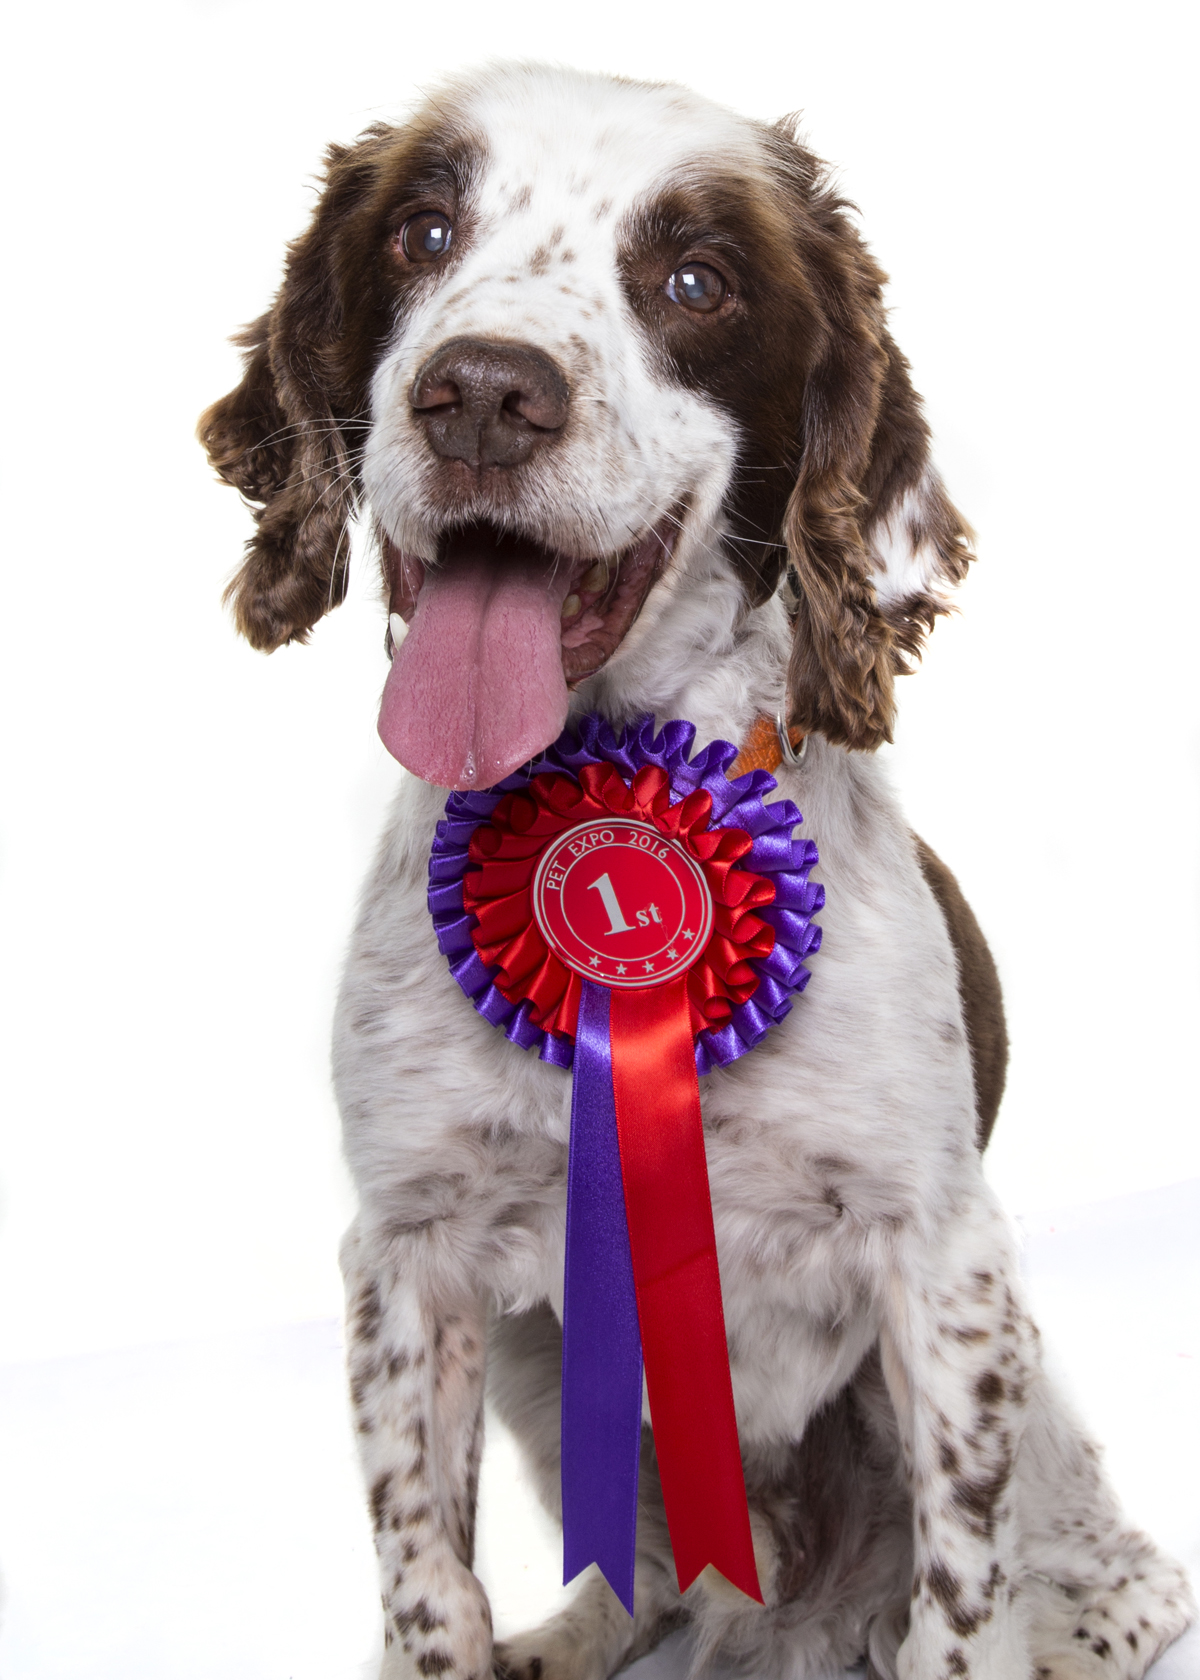 Pet Dog Turk Philip Murray Photography Dublin